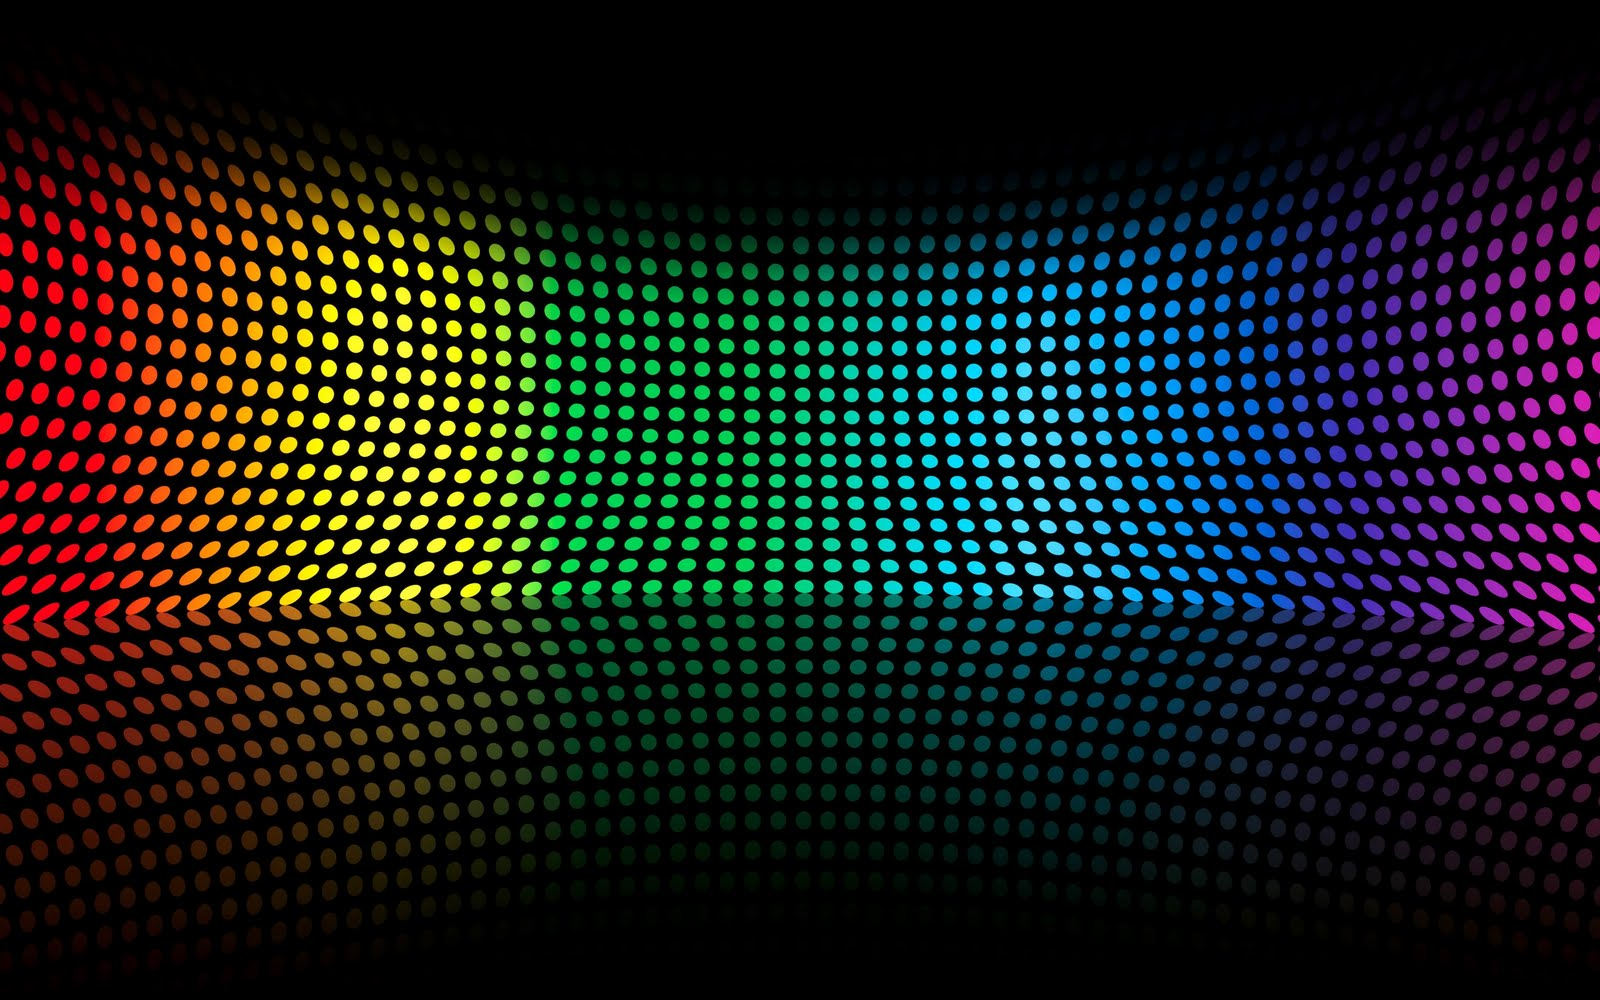 http://3.bp.blogspot.com/-NypnGEdpPis/TlLVIQFYXTI/AAAAAAAADRo/2CgolrQ9uMQ/s1600/abstrato-bolas-em-varias-cores-imagens-imagem-de-fundo-wallpaper-para-pc-computador-tela-gratis-ambiente-de-trabalho.jpg